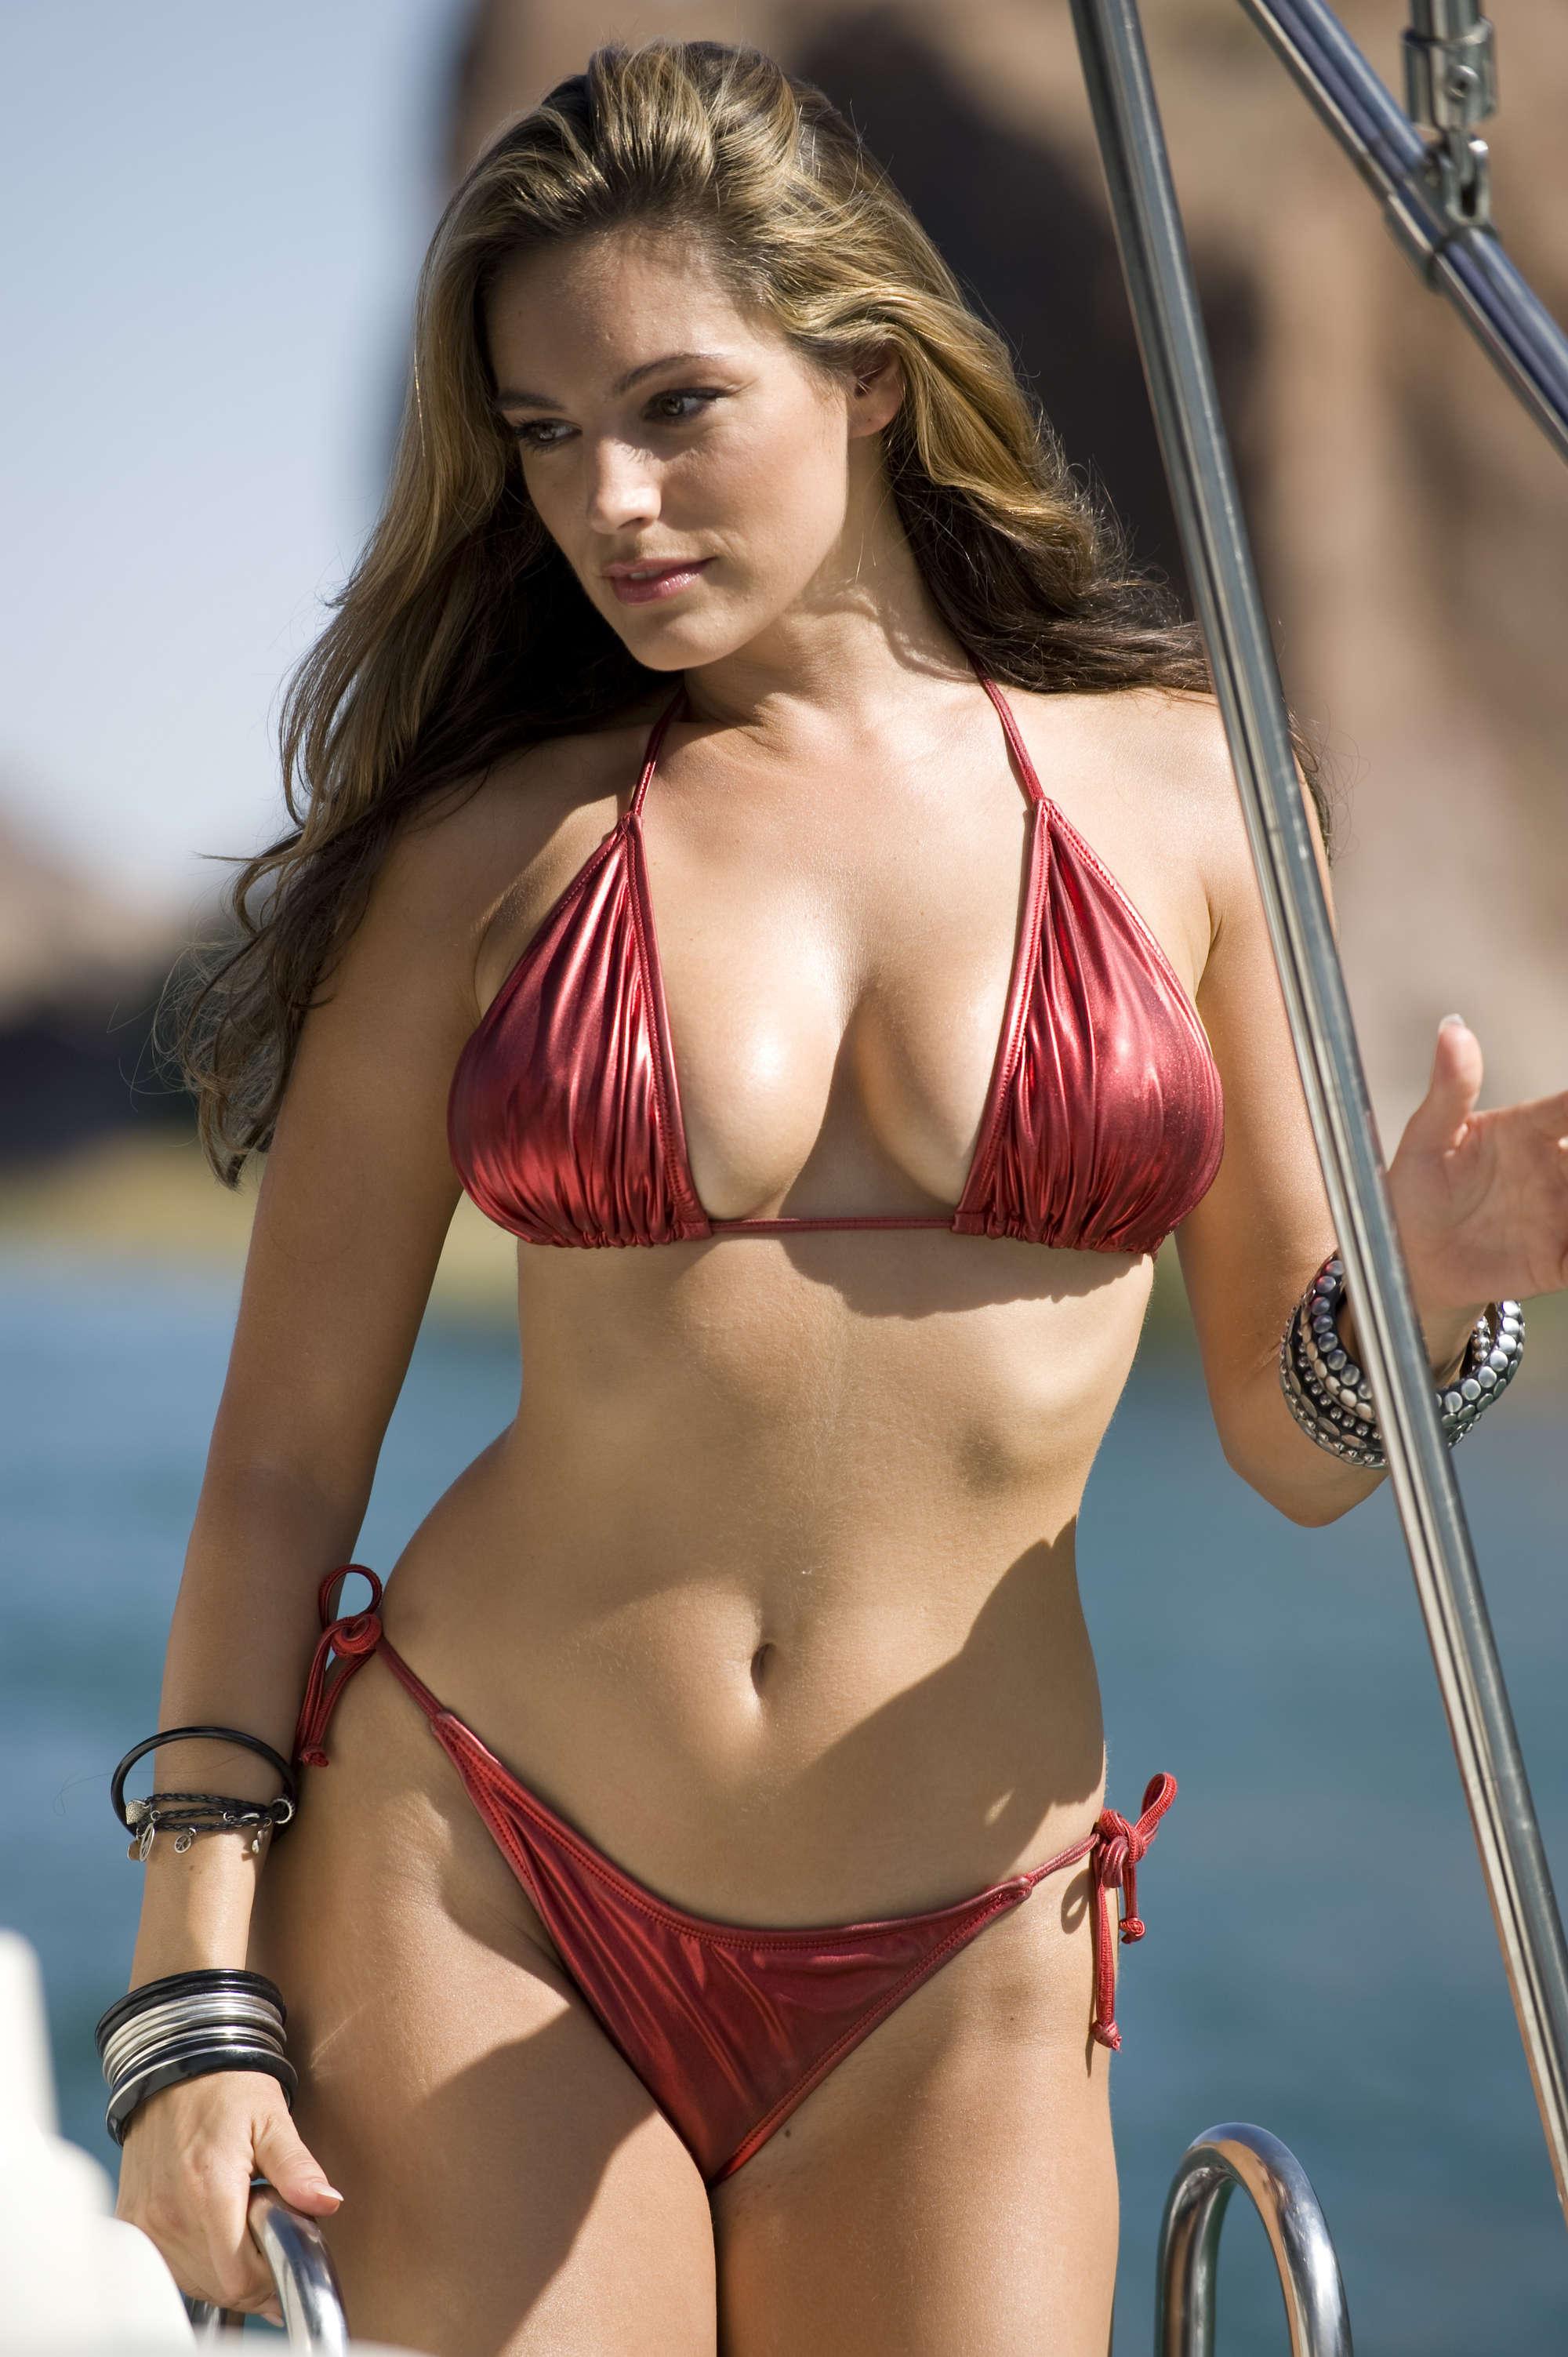 Kelly Brook Hot In Bikini 04 Full Size